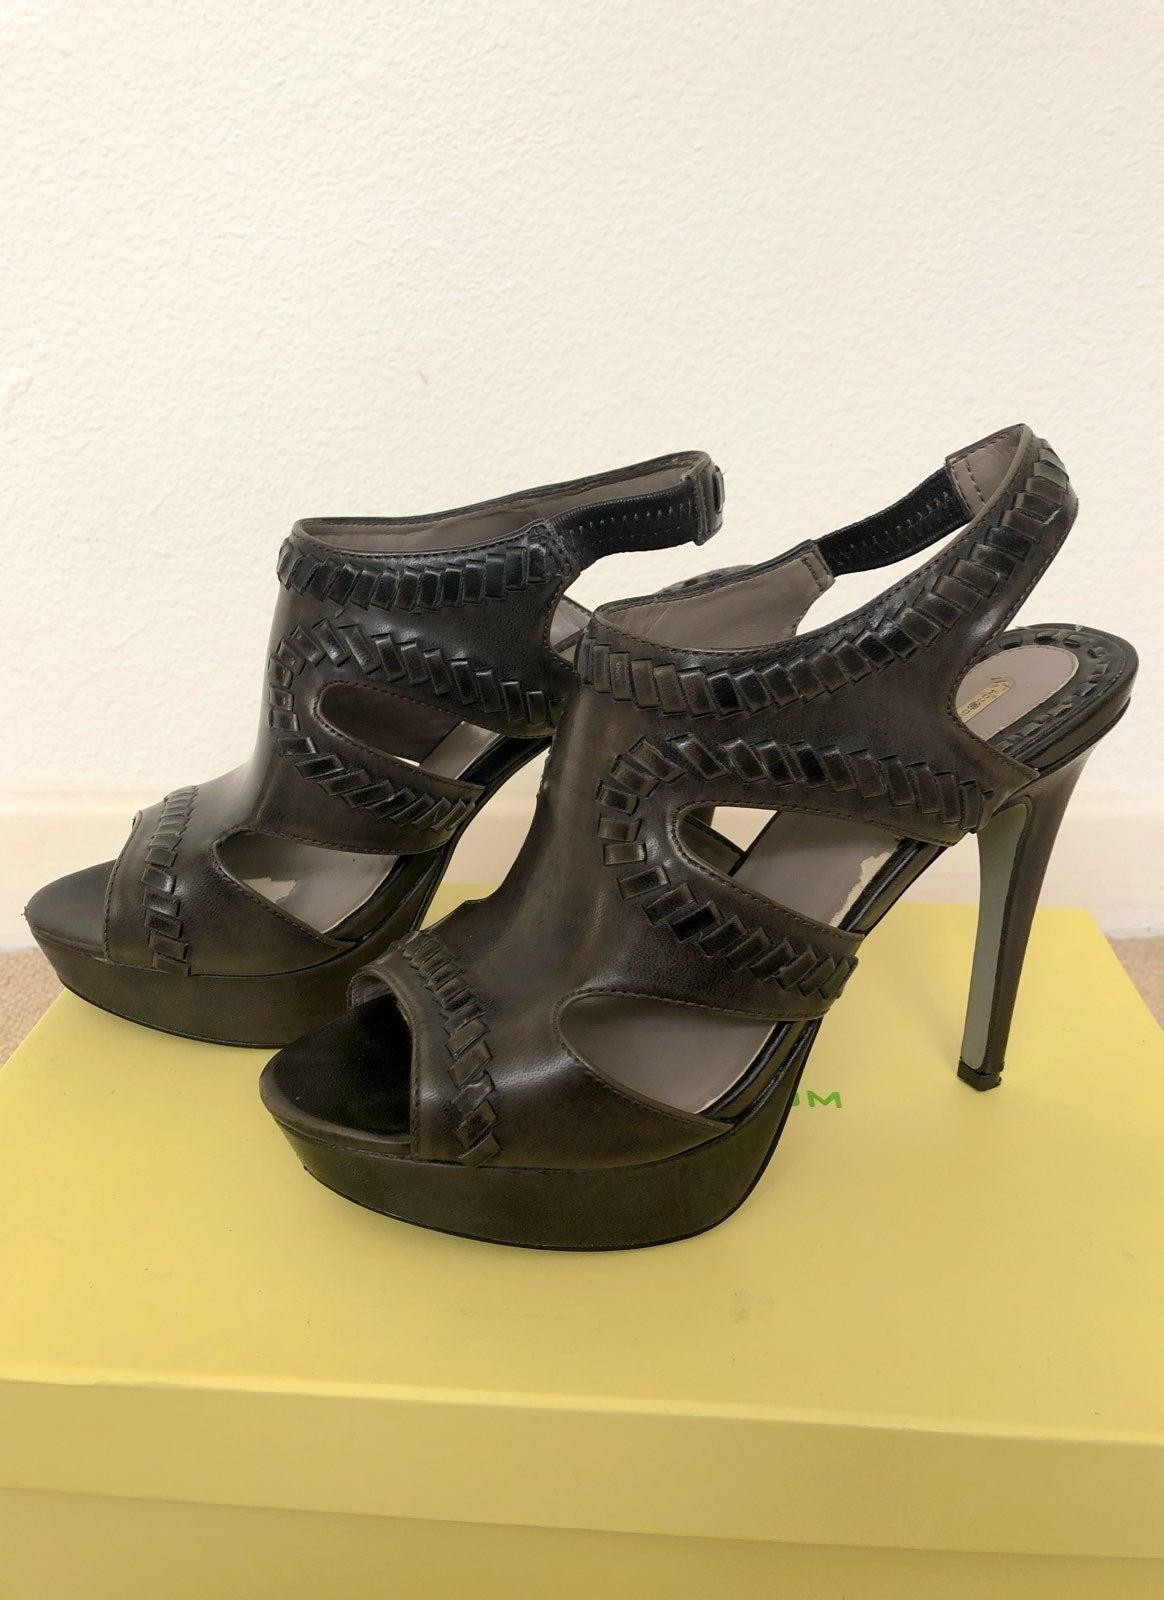 MaxStudio Xist Platform Heeled Sandal